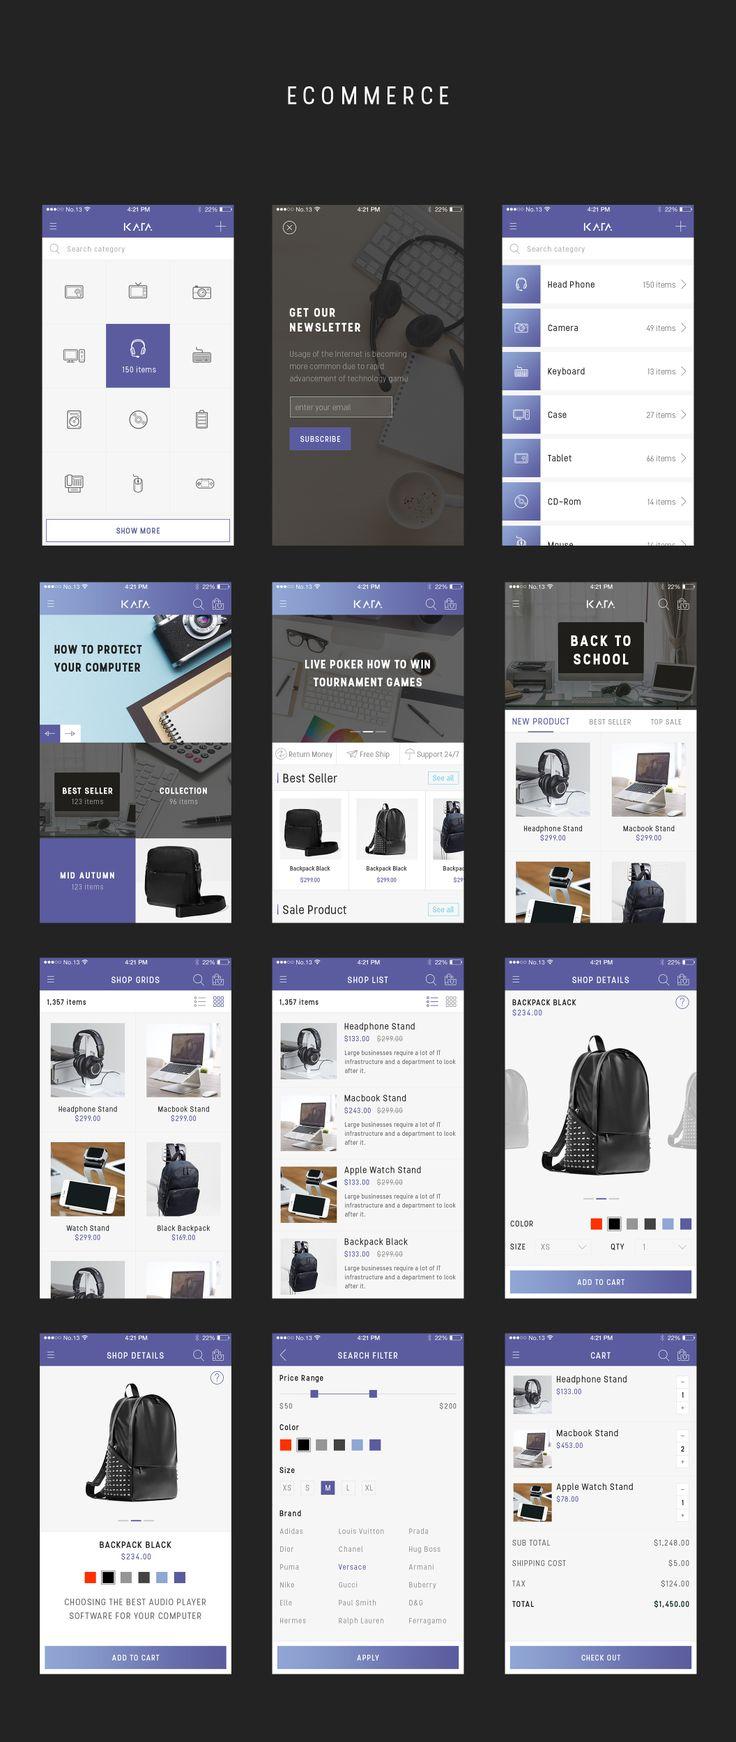 581 best App design | UI/UX images on Pinterest | User interface ...